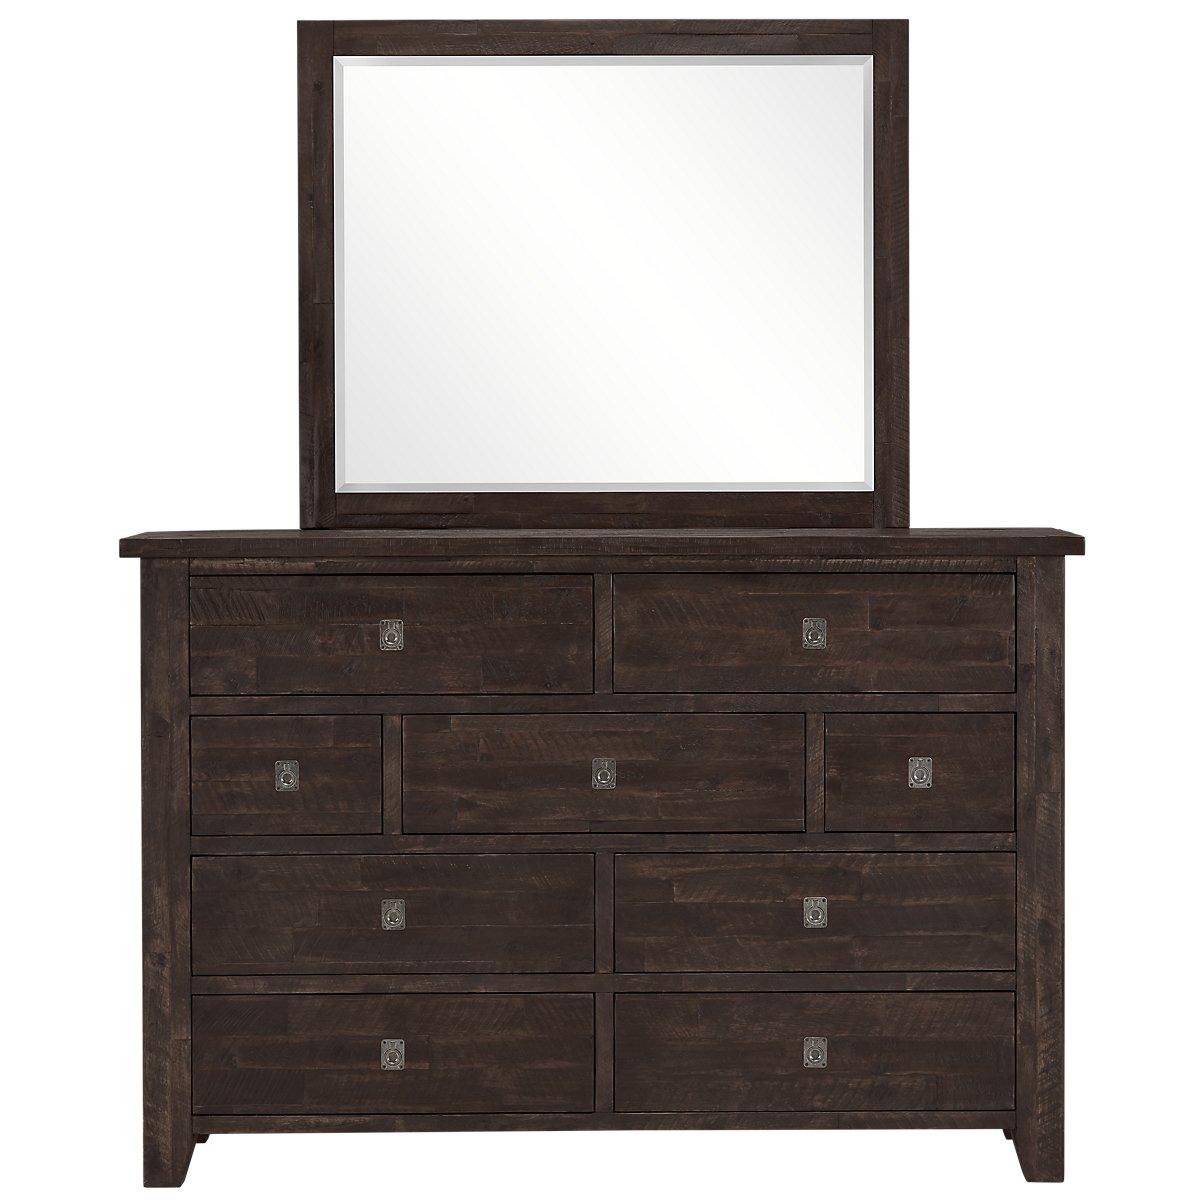 Kona Grove Dark Tone Wood Dresser & Mirror